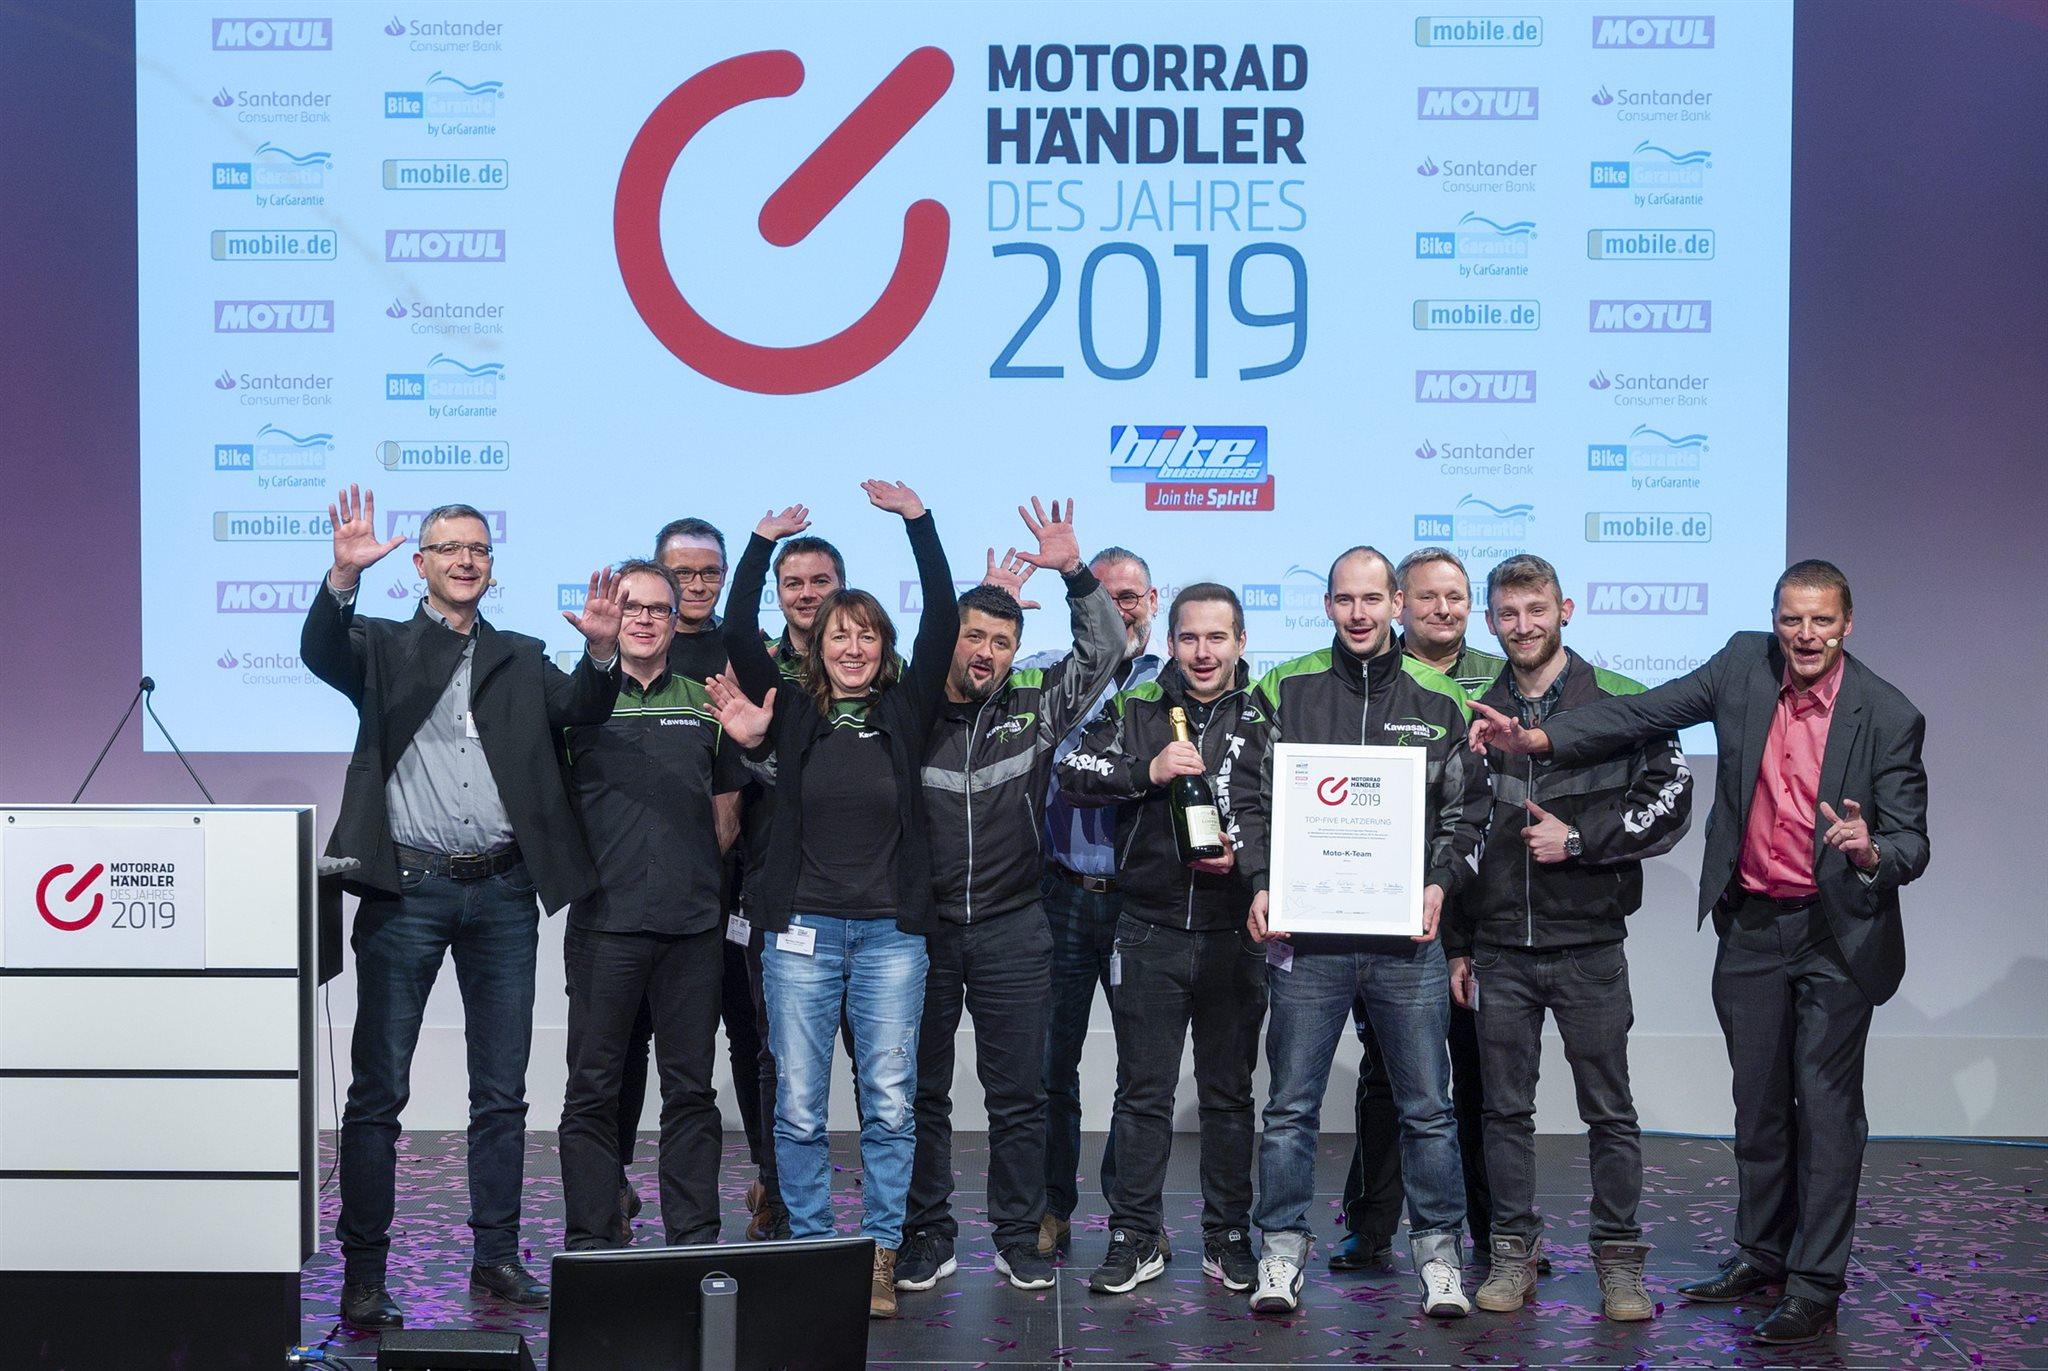 Motorradhändler des Jahres 2019 -Top Five-